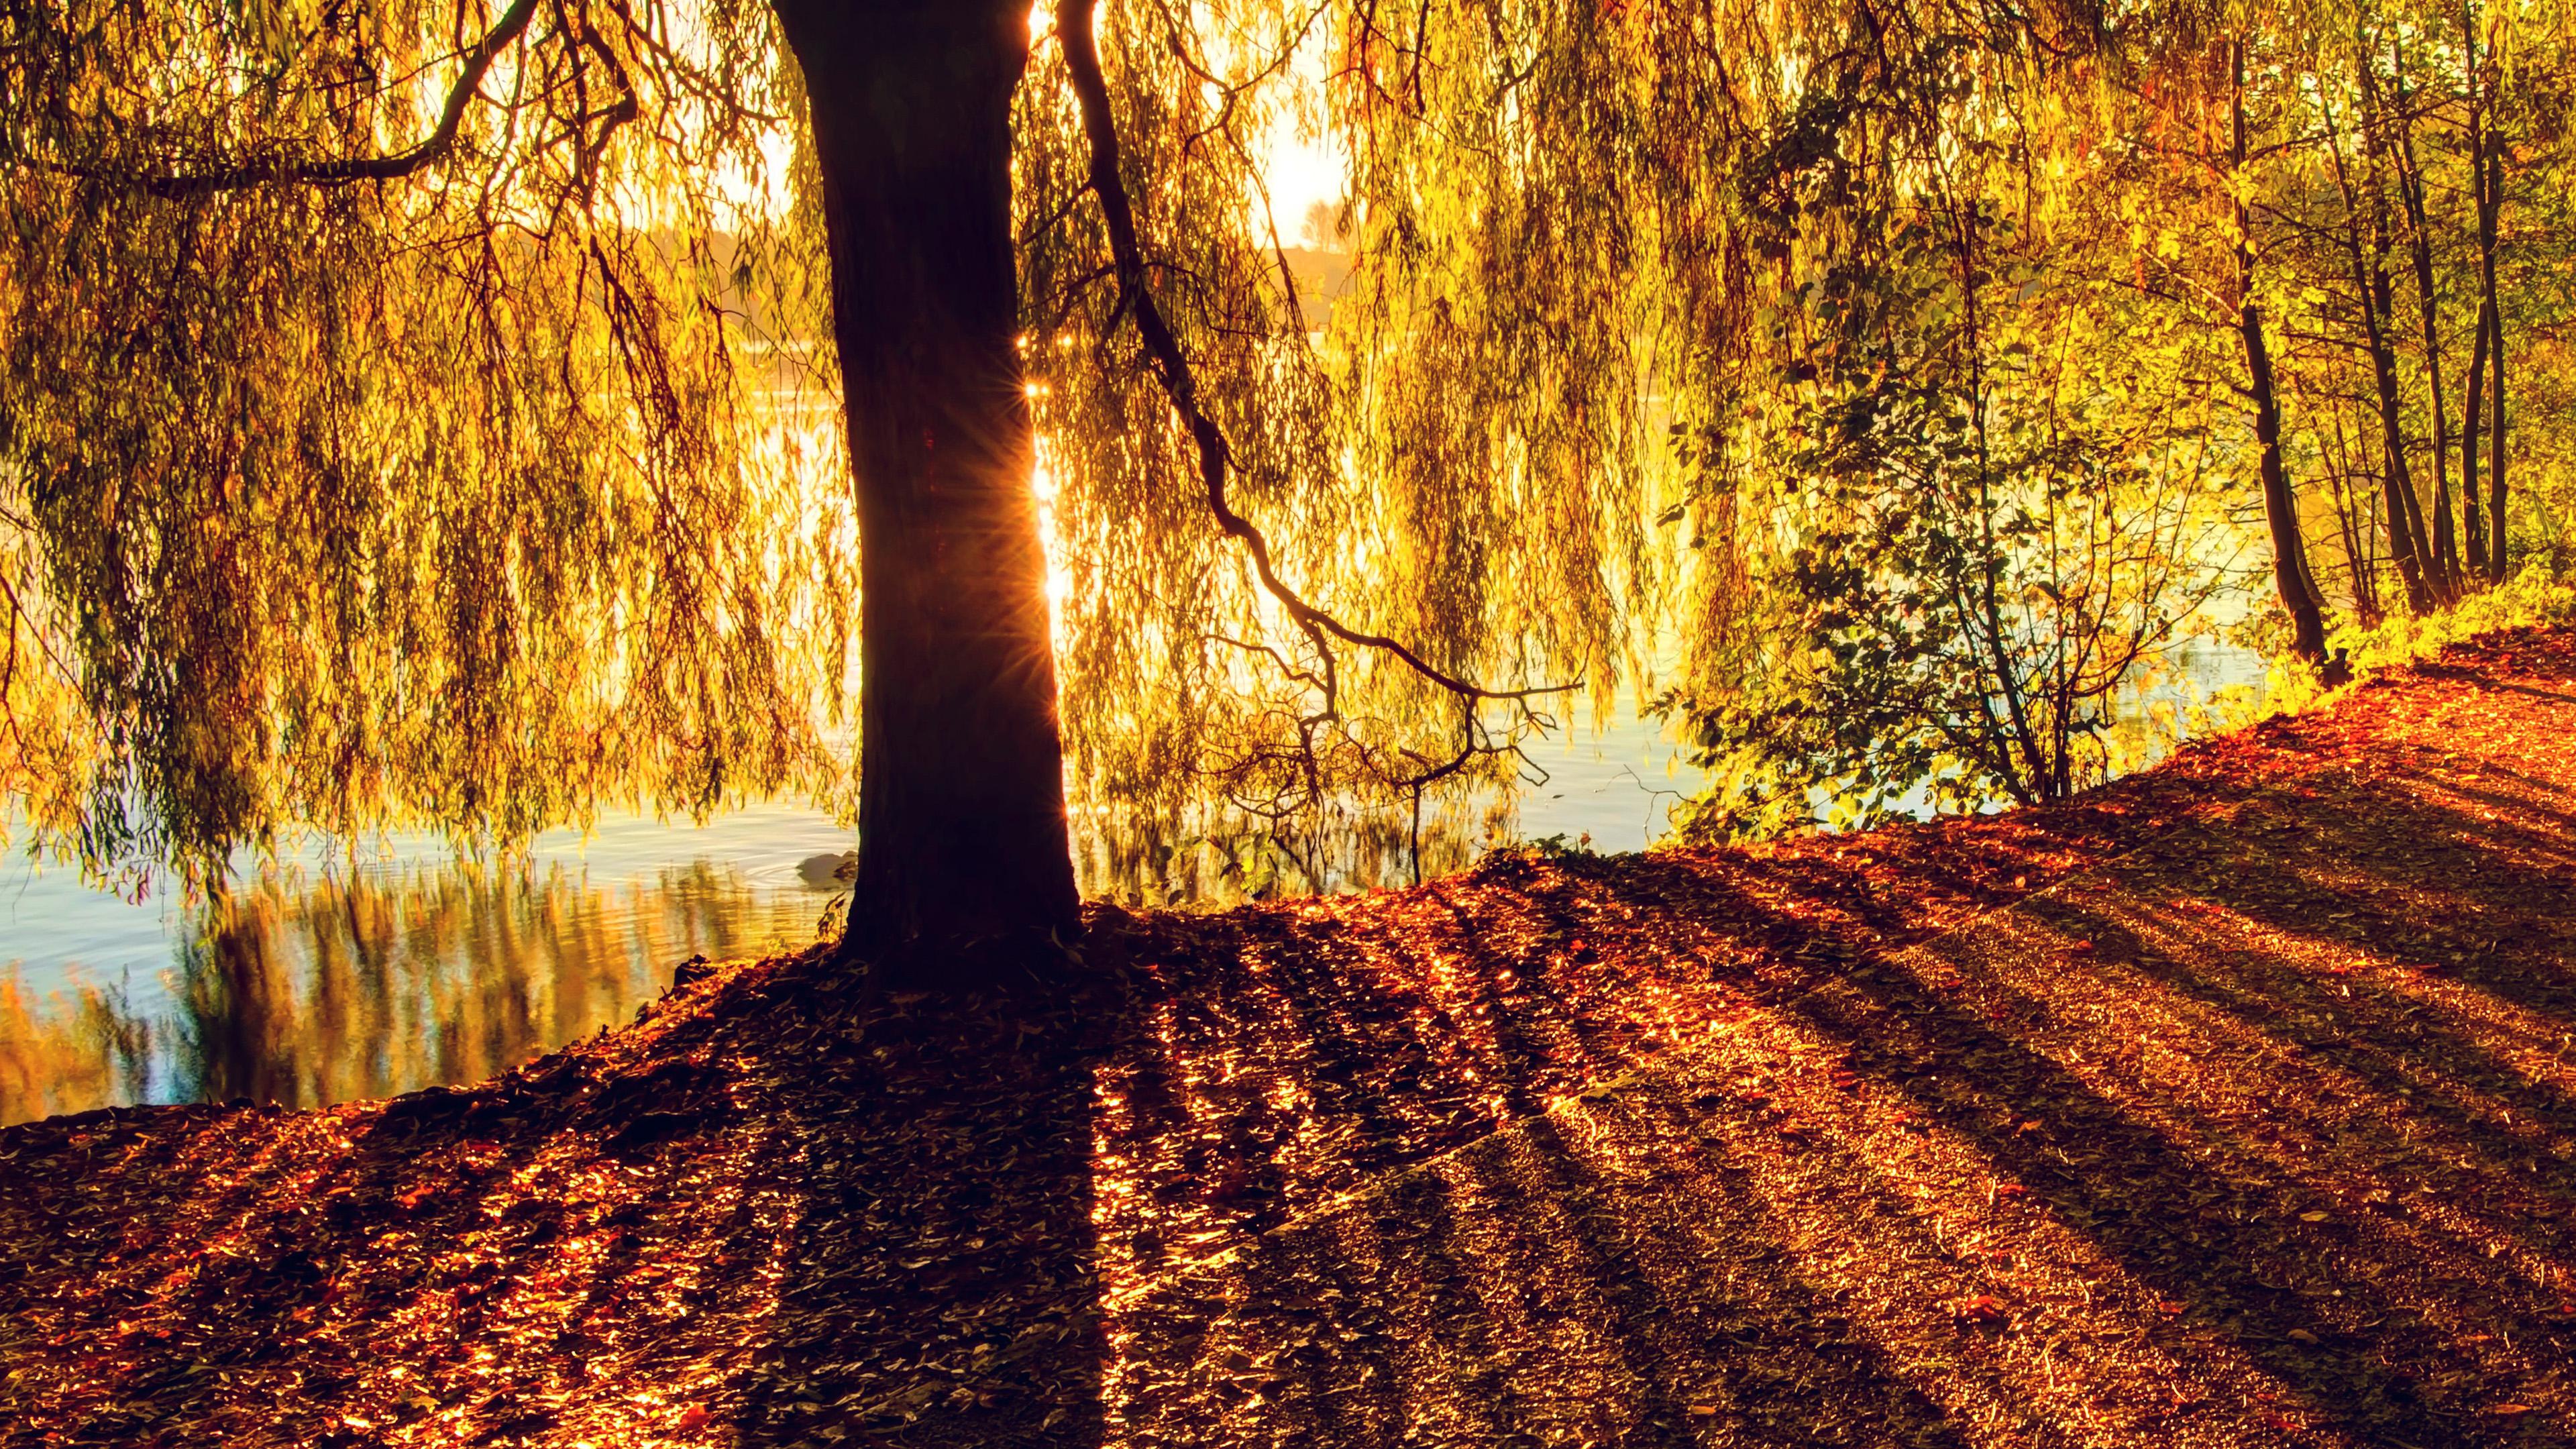 sunshine nature morning tree lake desktop mt35 2160 4k wallpapers papers 2400 macbook 2560 1080 1600 1920 december imac